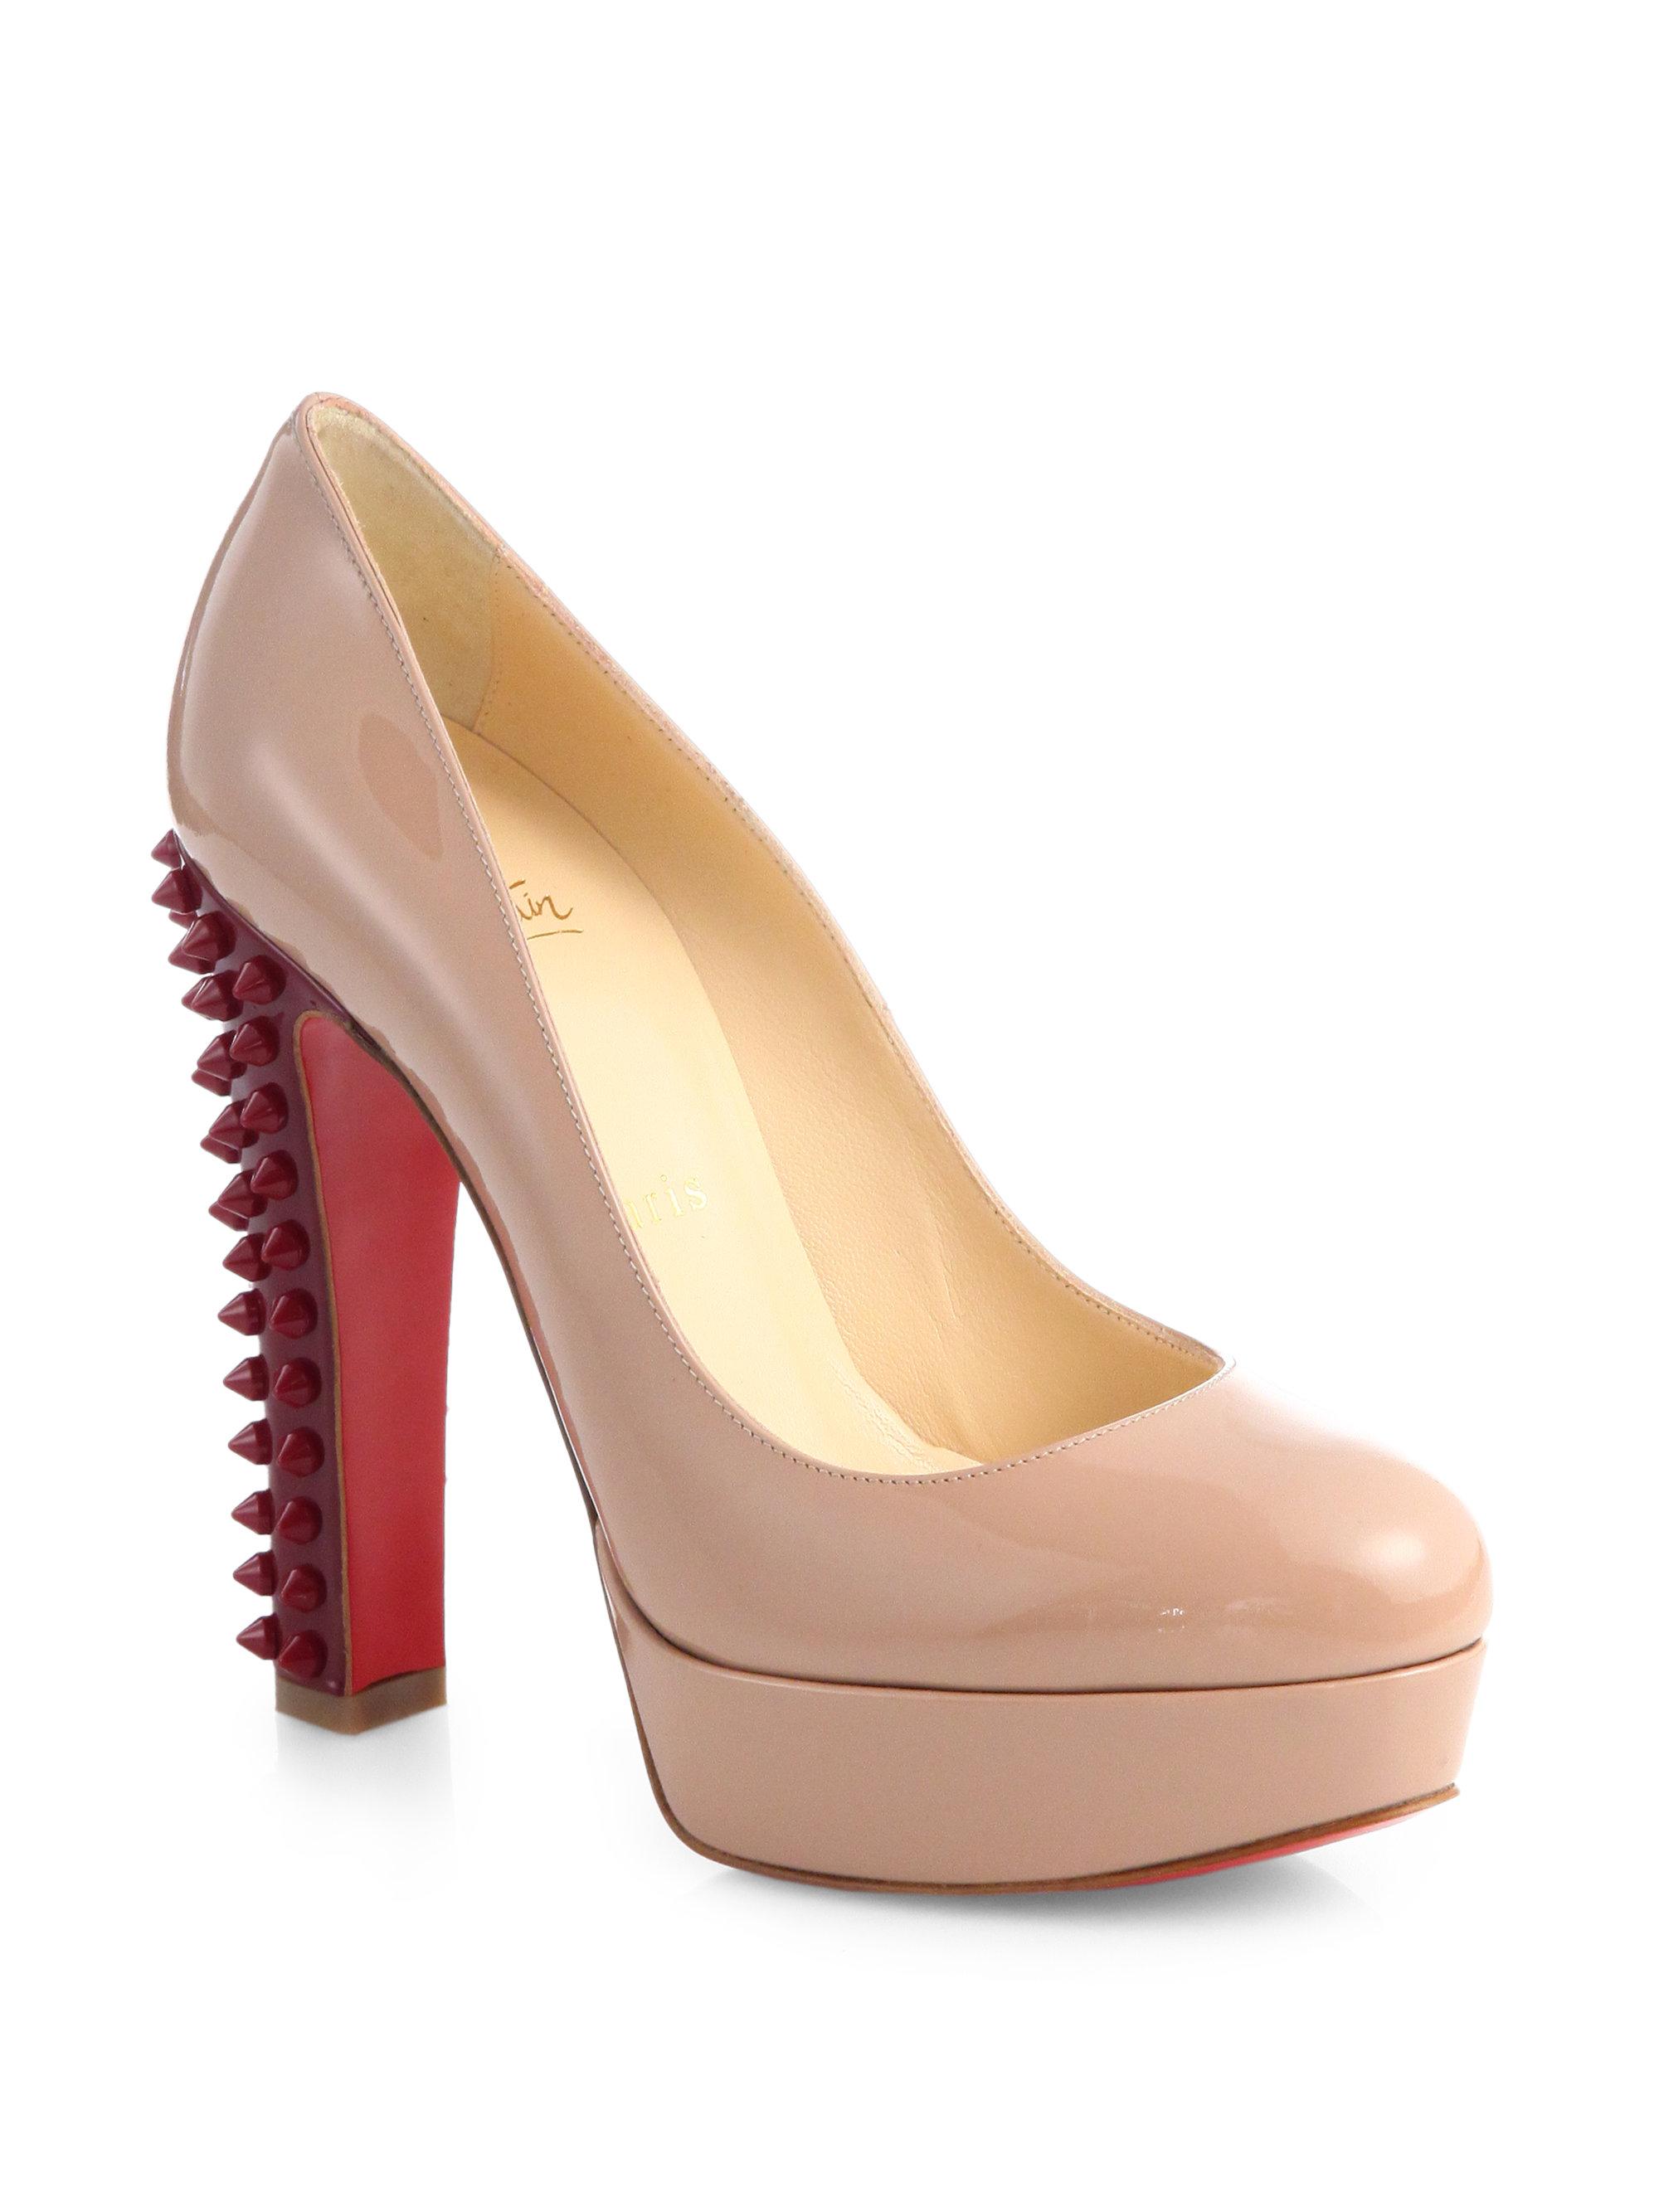 christian louboutin man shoes - christian louboutin exagona glitter platform pumps